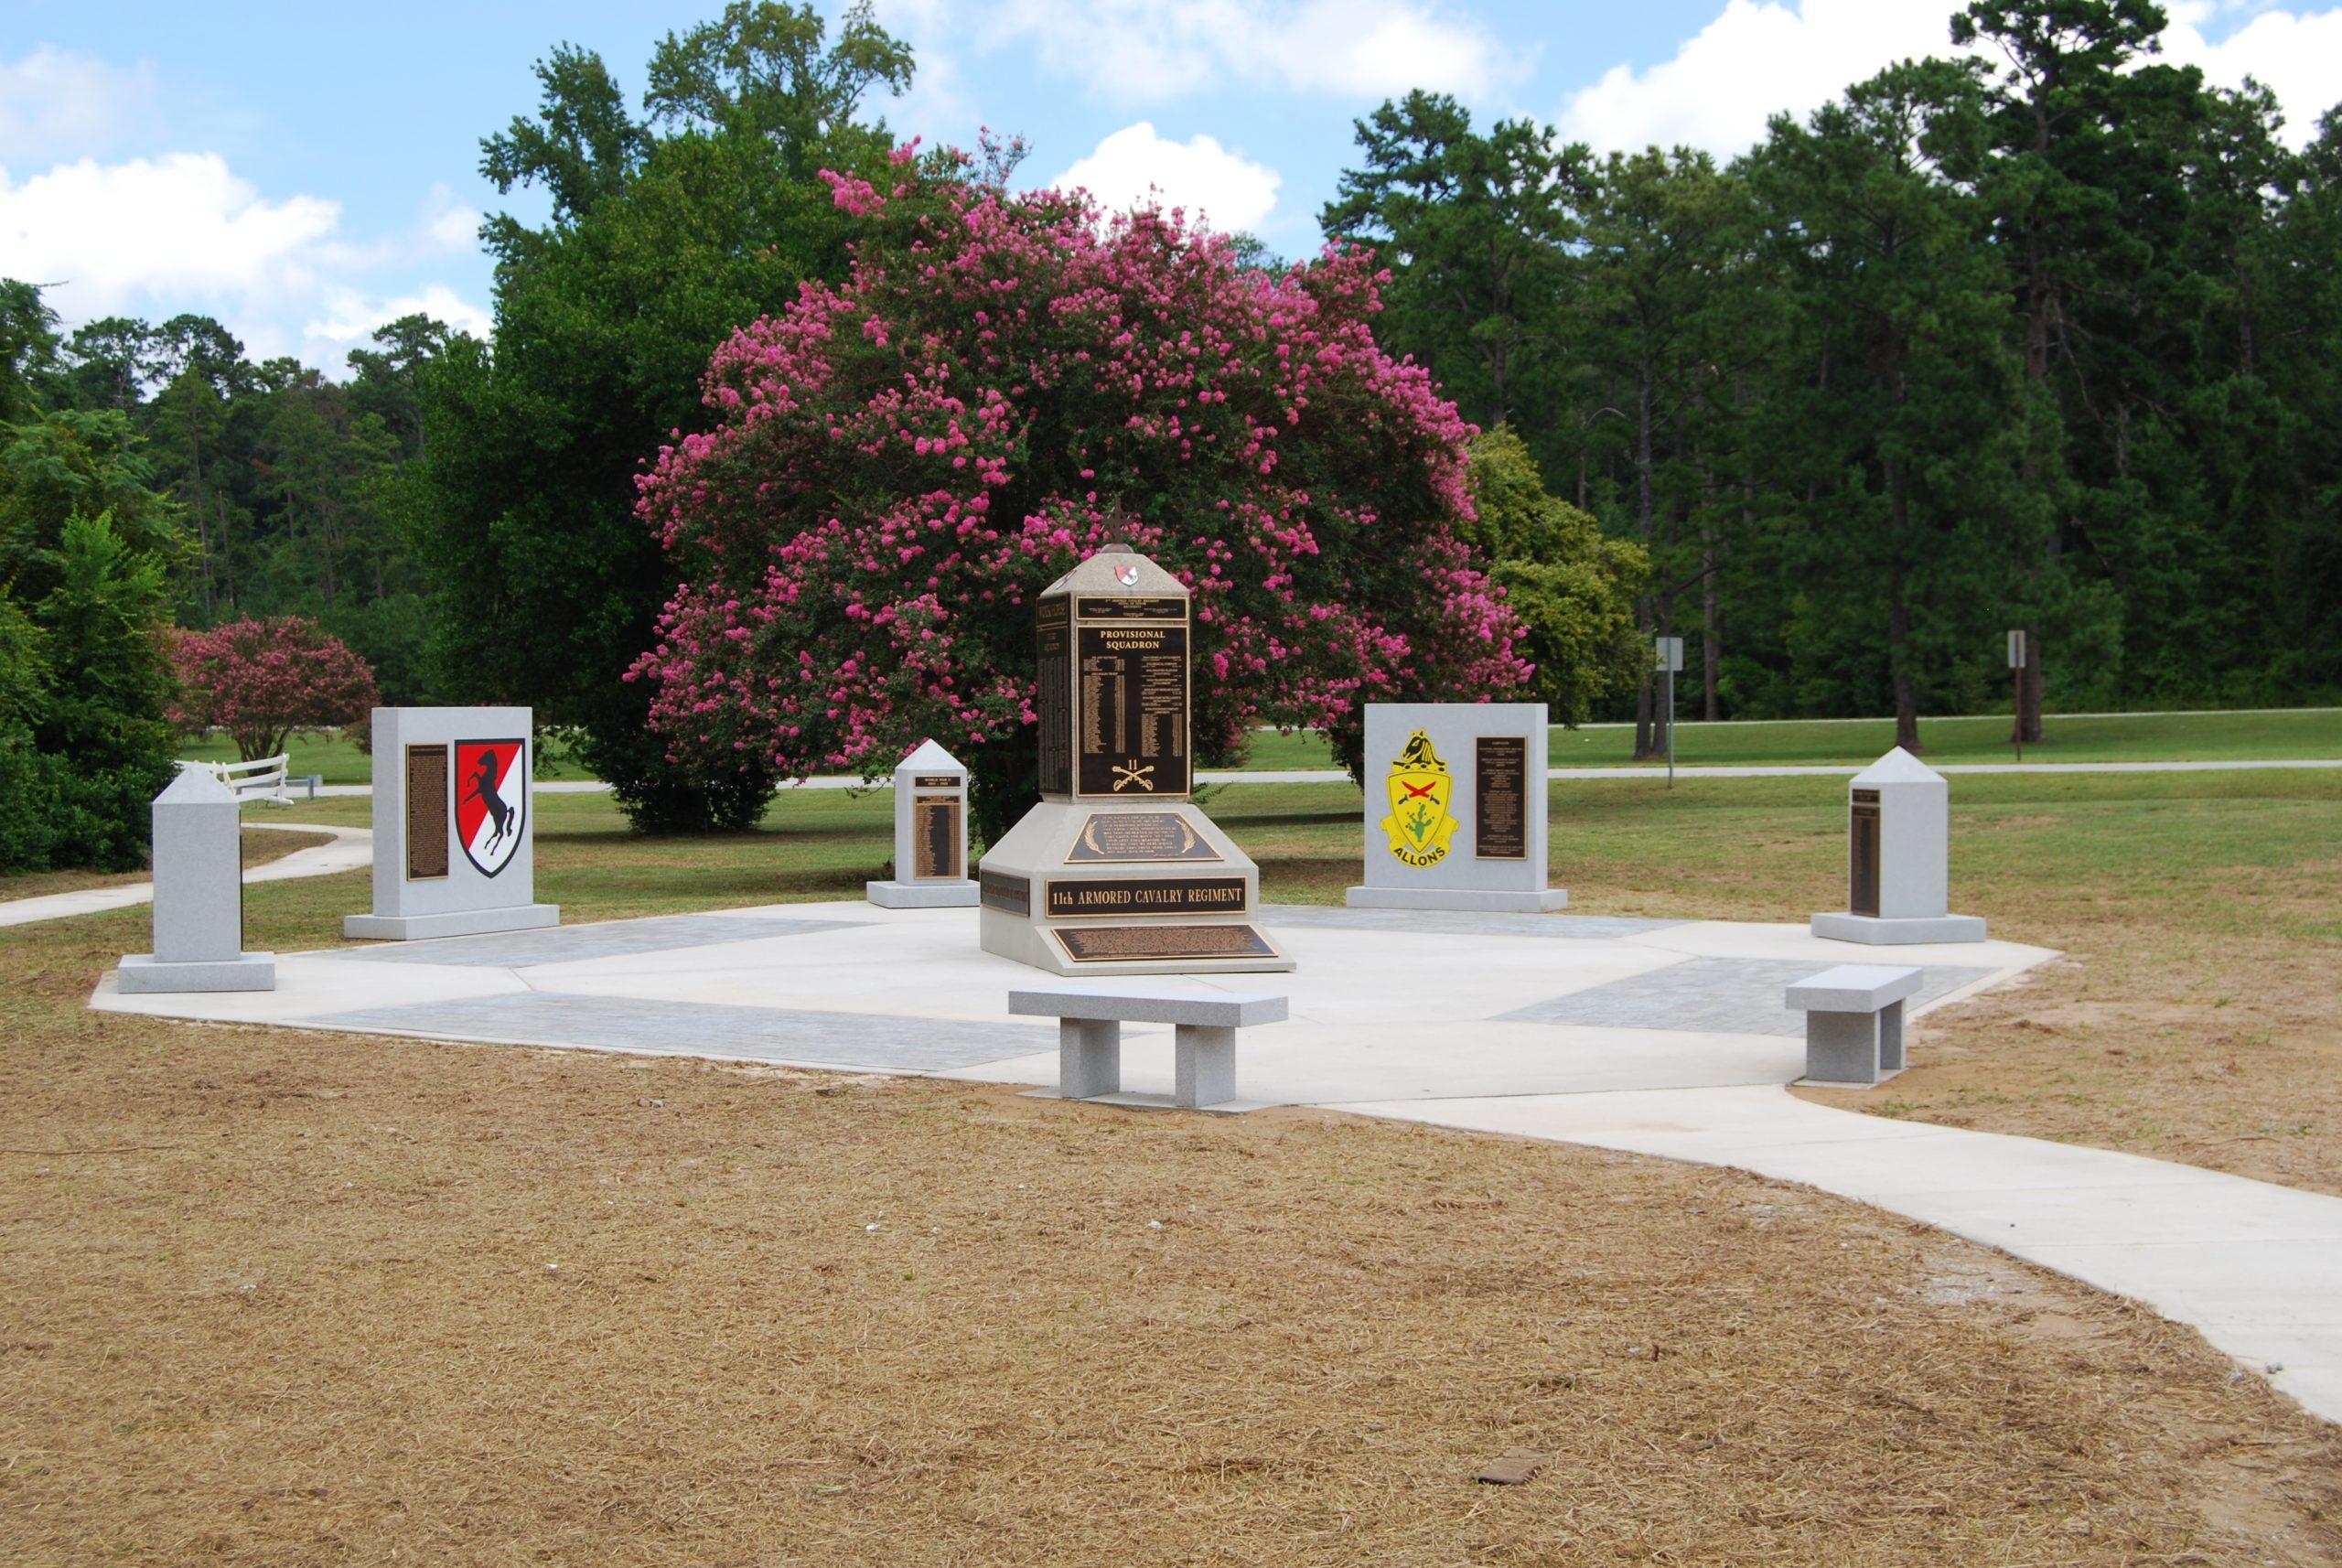 Blackhorse Memorial at Fort Benning